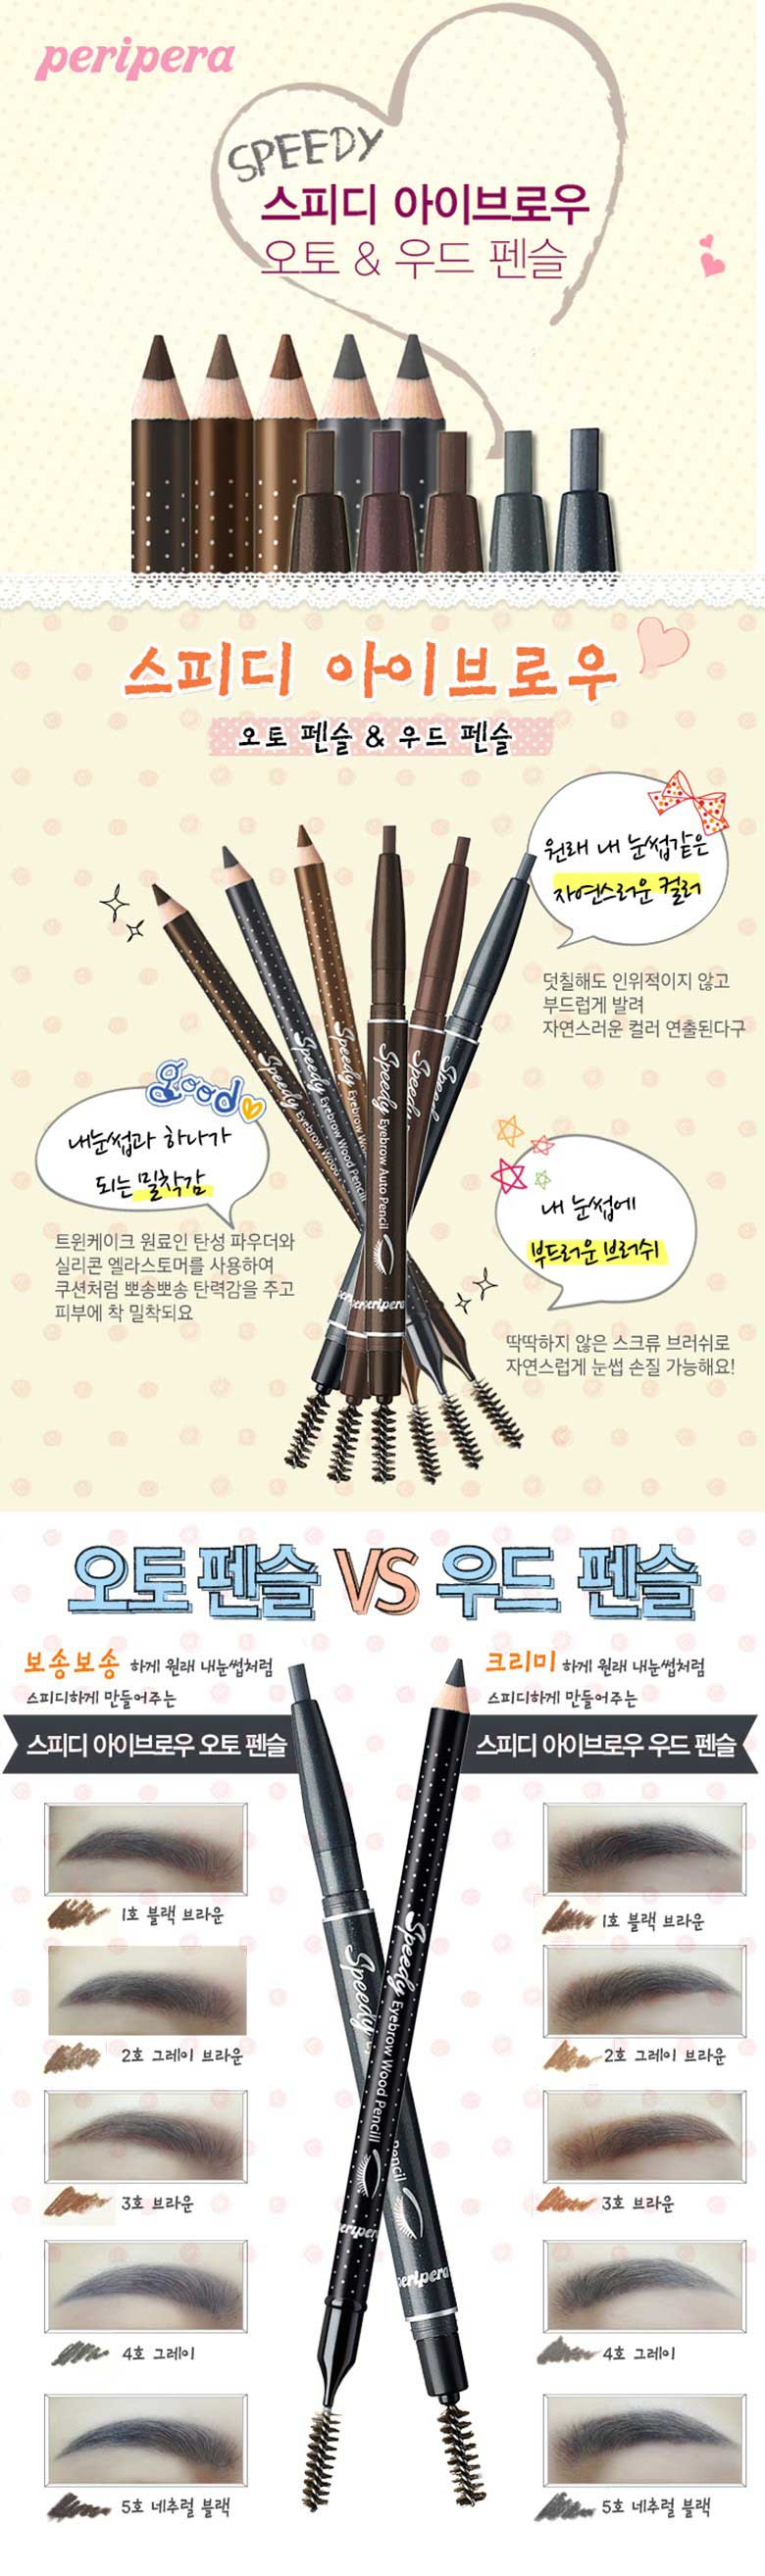 [ShiPAPA] Peripera | Speedy Eyebrow Wood Pencil| 韓國直送🇰🇷 | 香港 澳門